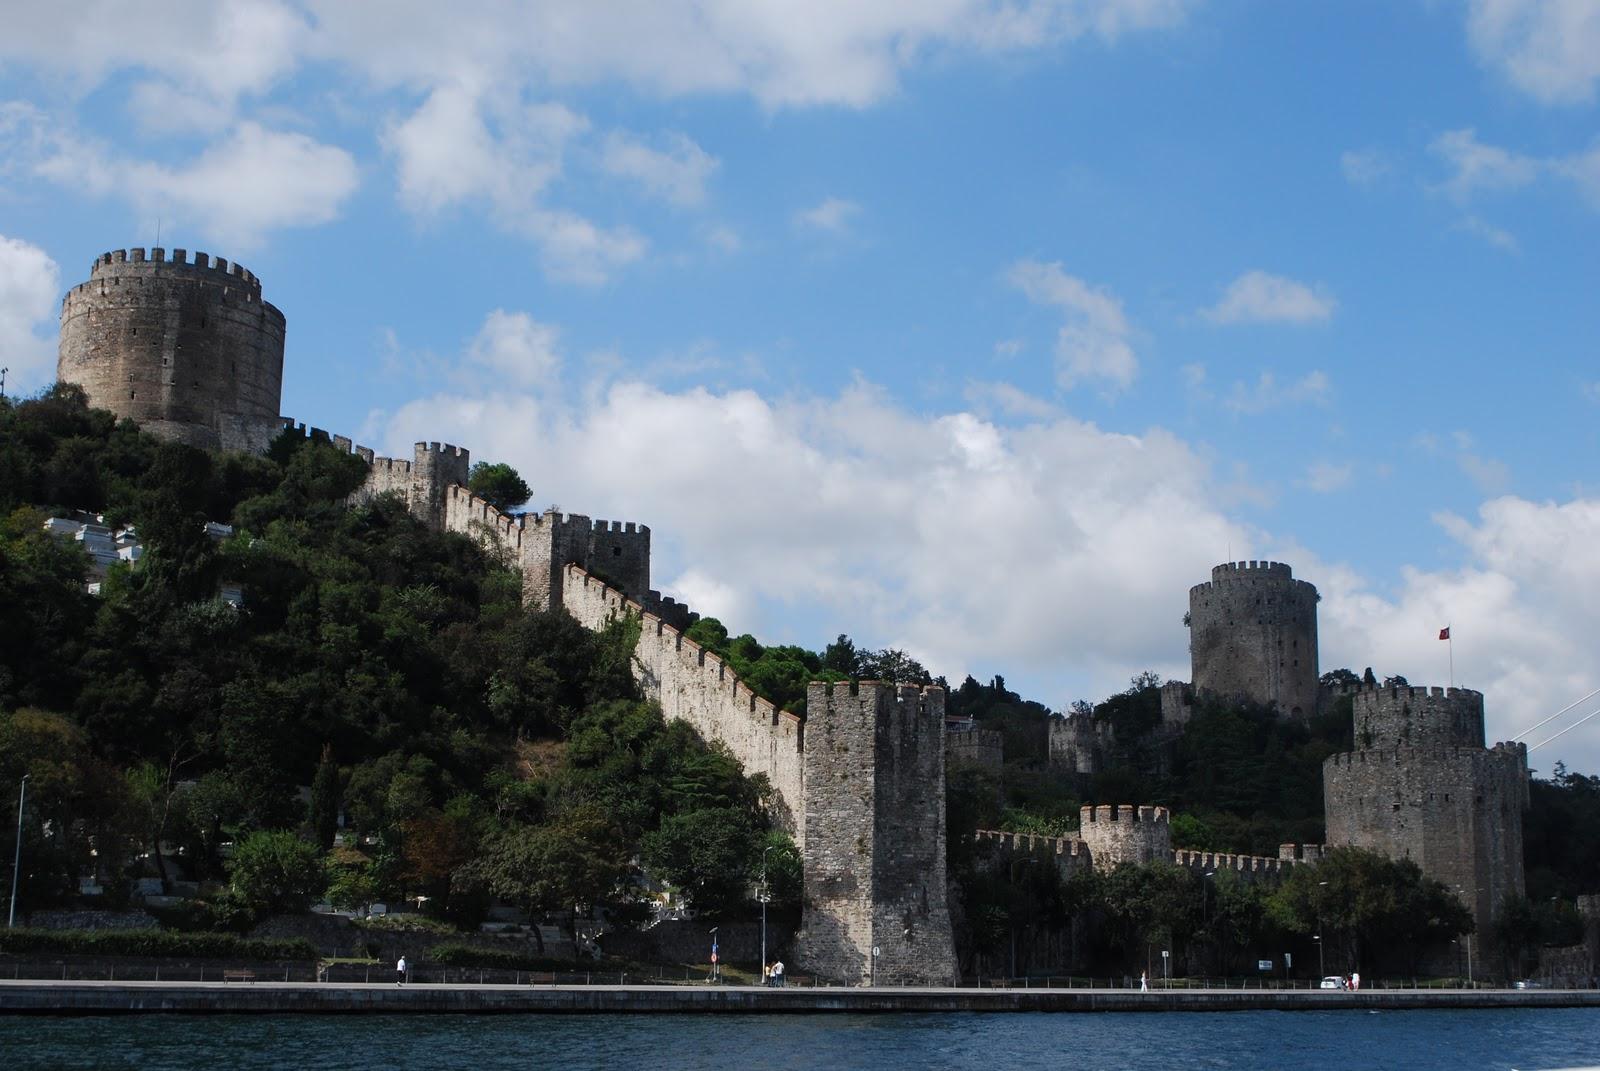 http://2.bp.blogspot.com/_pv5ccRkAhck/TKE9UBcG-bI/AAAAAAAABhM/l8fwArKiAQ0/s1600/Bosphorus+Cruise+%2870%29.JPG